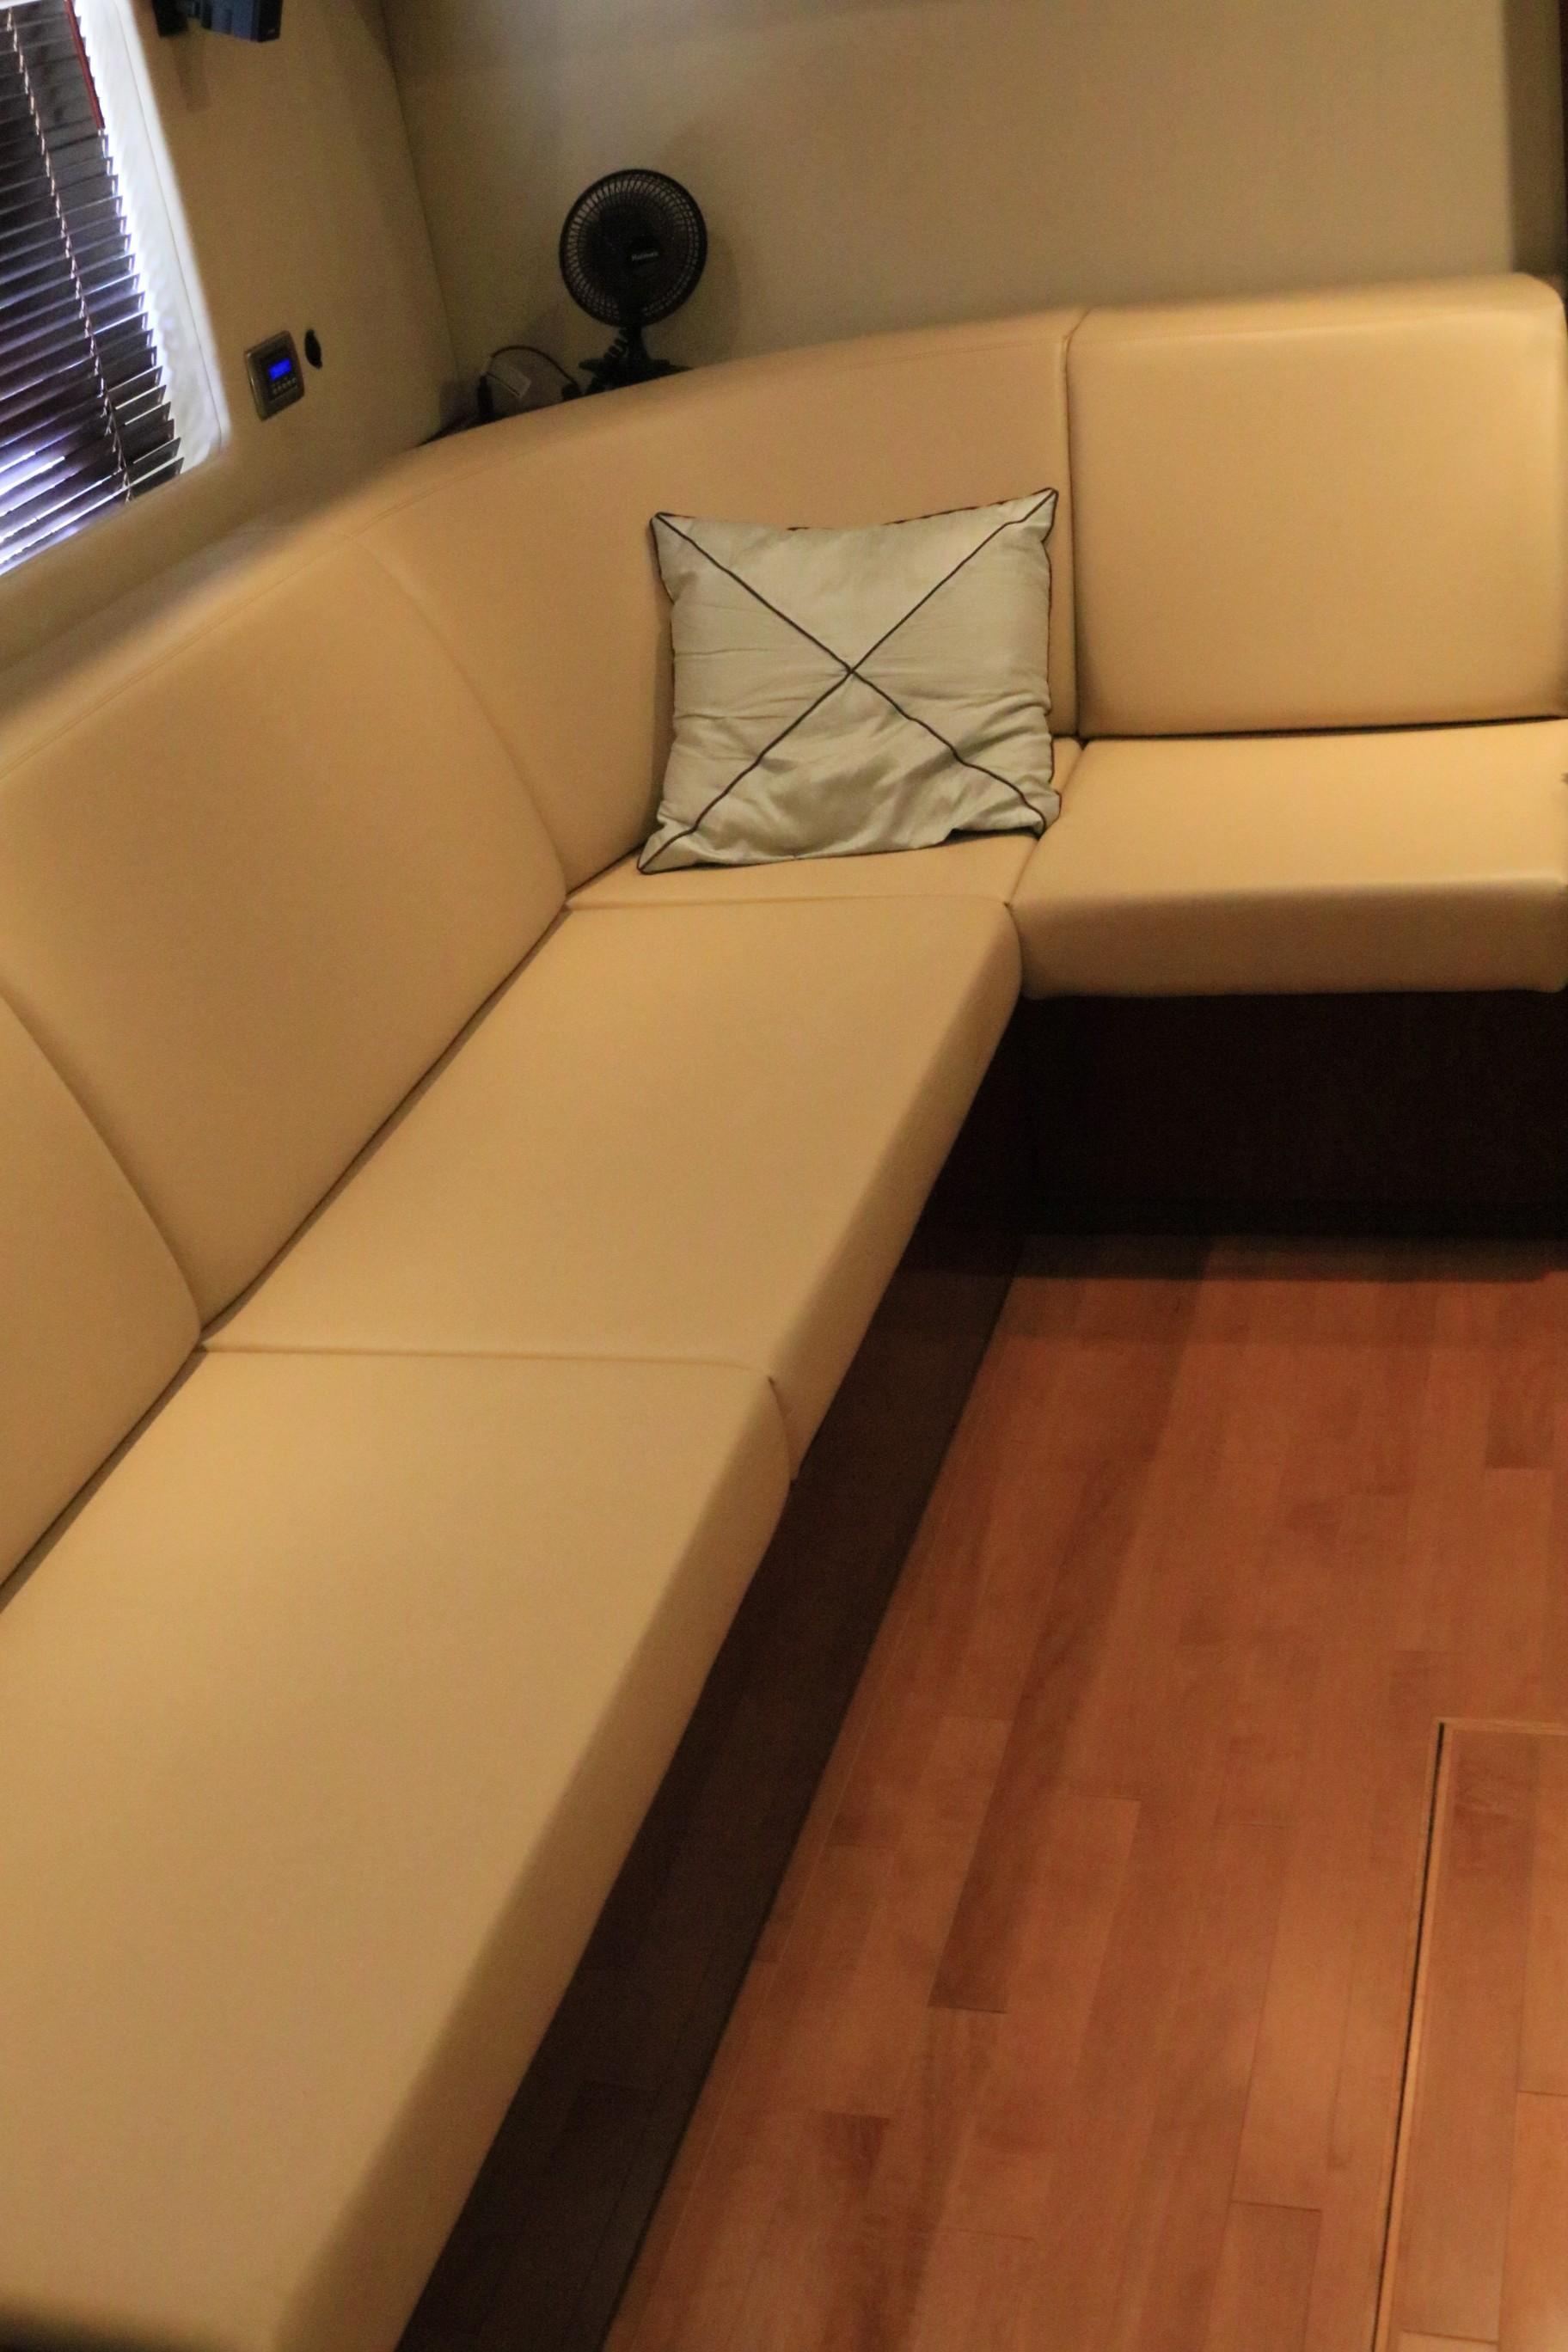 Groovy 55 Sea Ray Black Diamond 2008 Sarasota Denison Yacht Sales Pabps2019 Chair Design Images Pabps2019Com